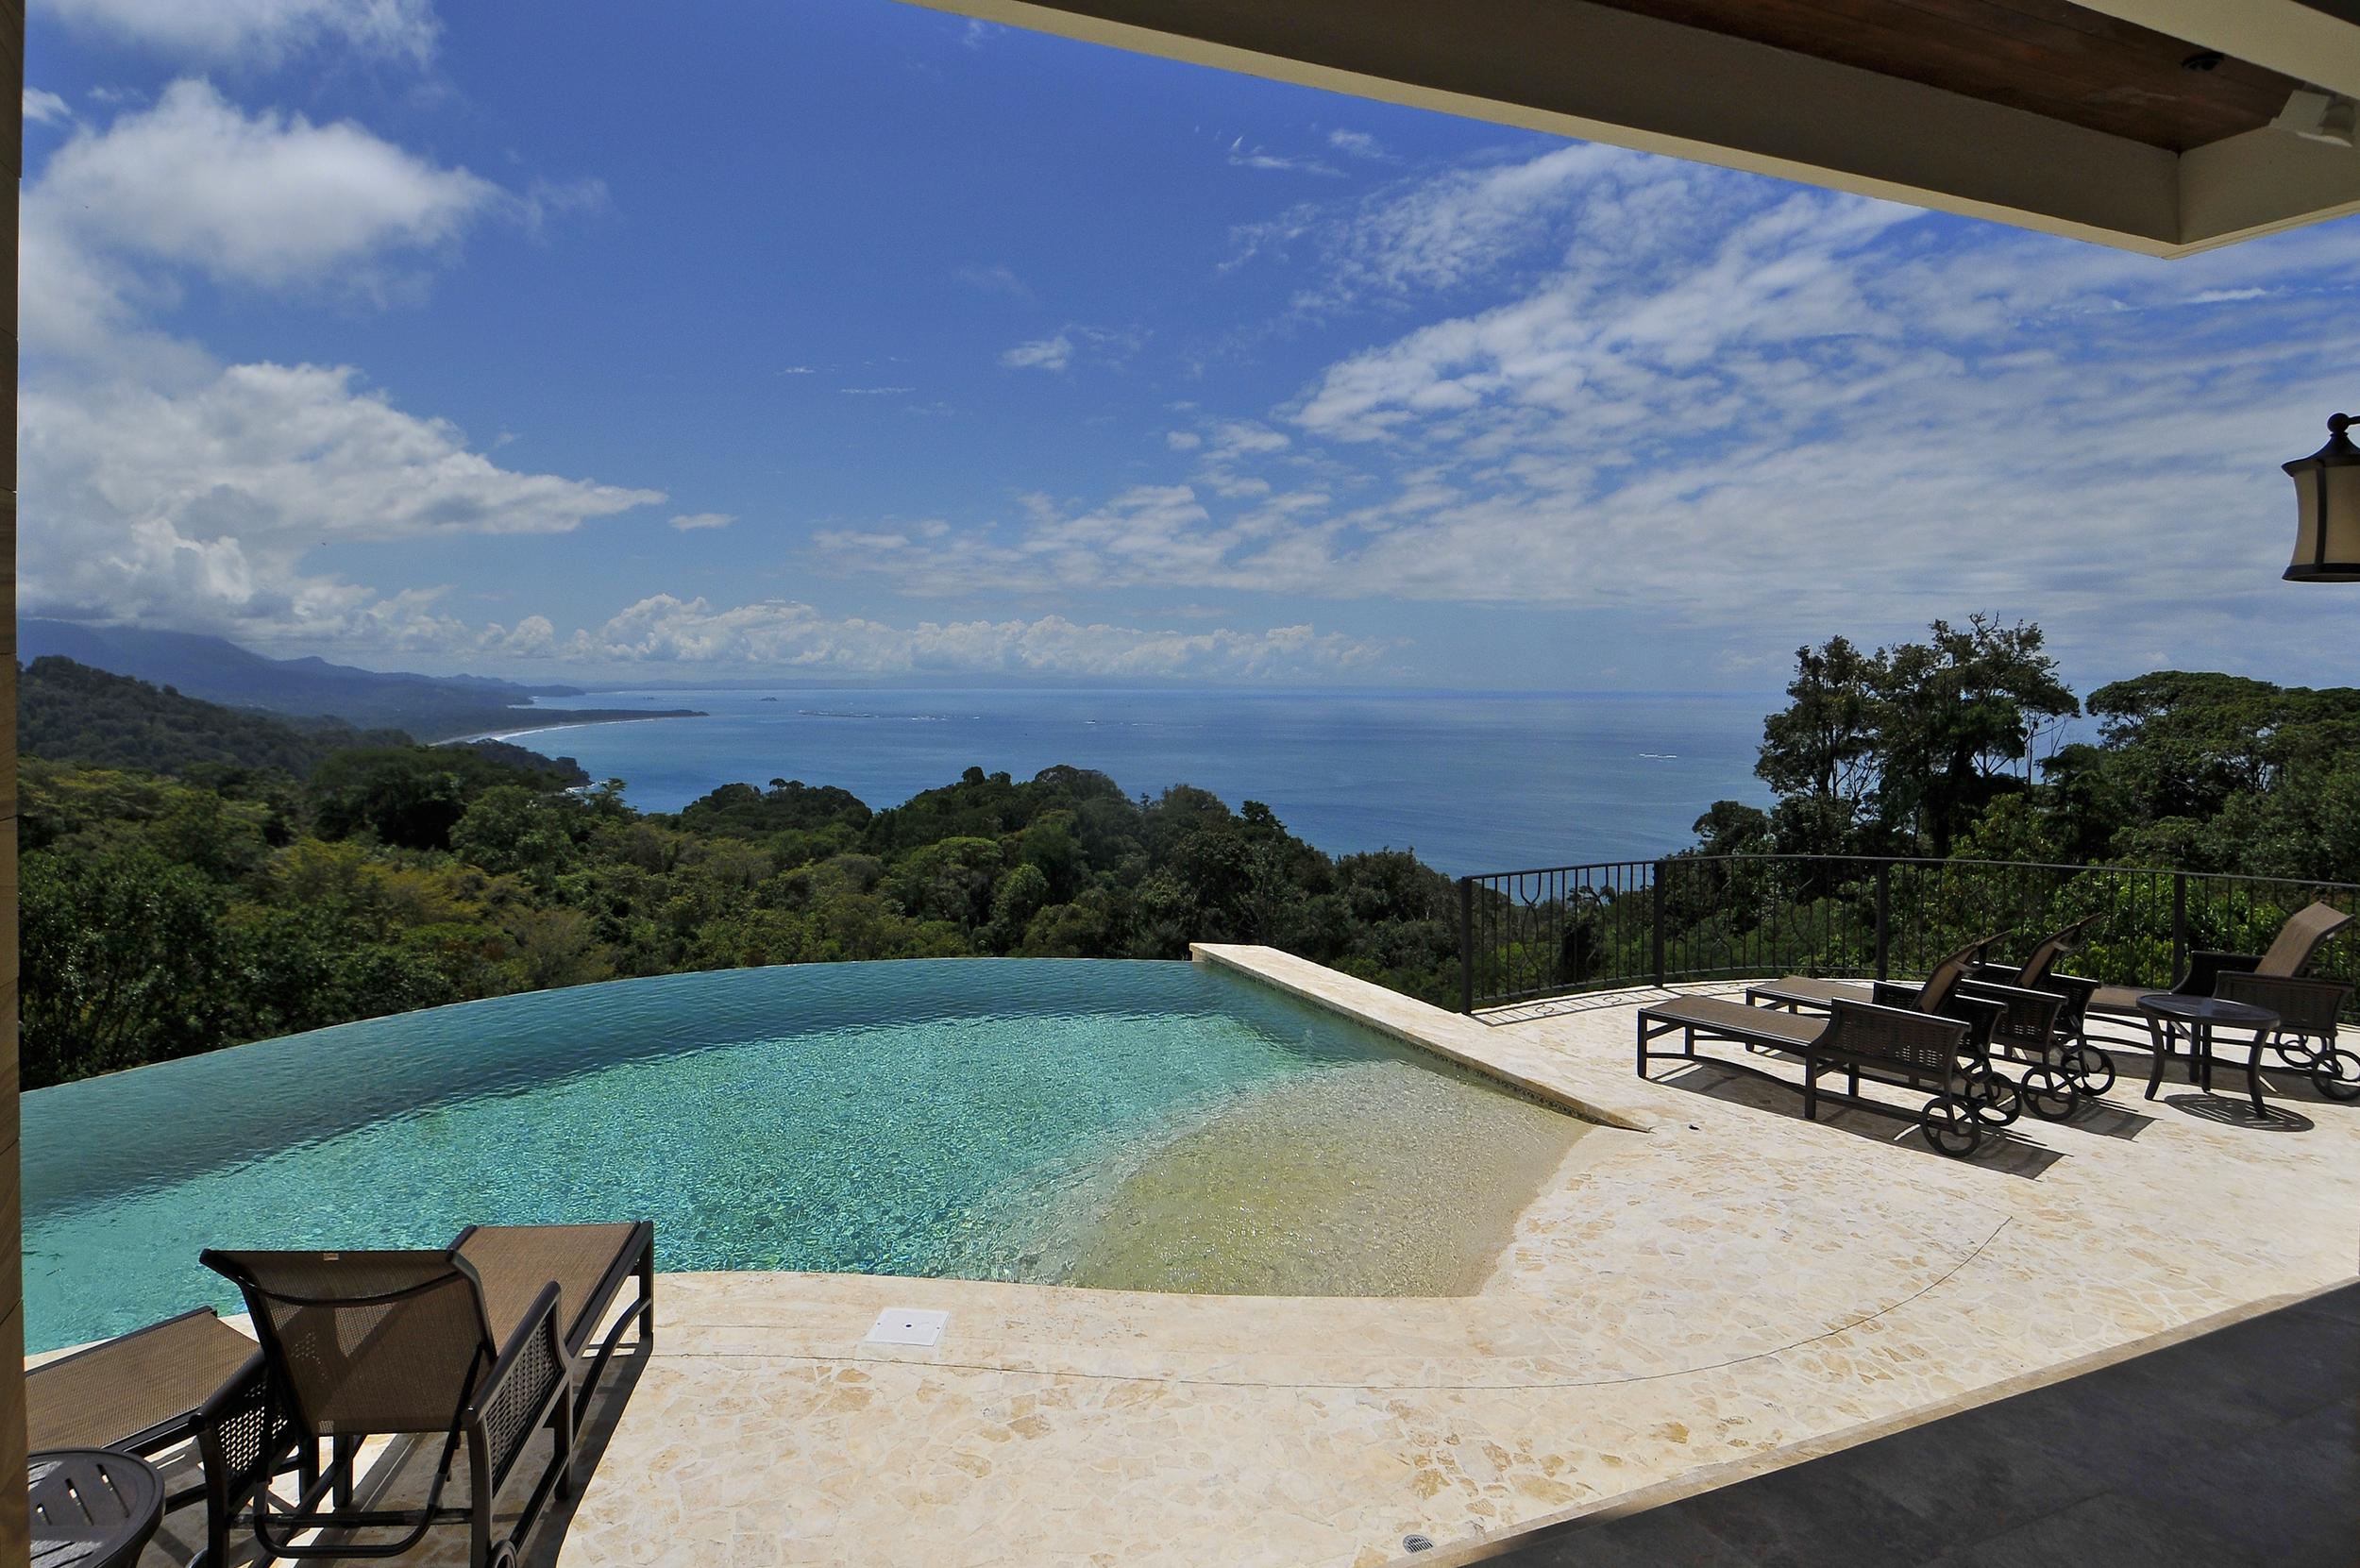 flex5-yoga-retreat-costa-rica-villa-infinity-pool-day-ocean-view.jpg